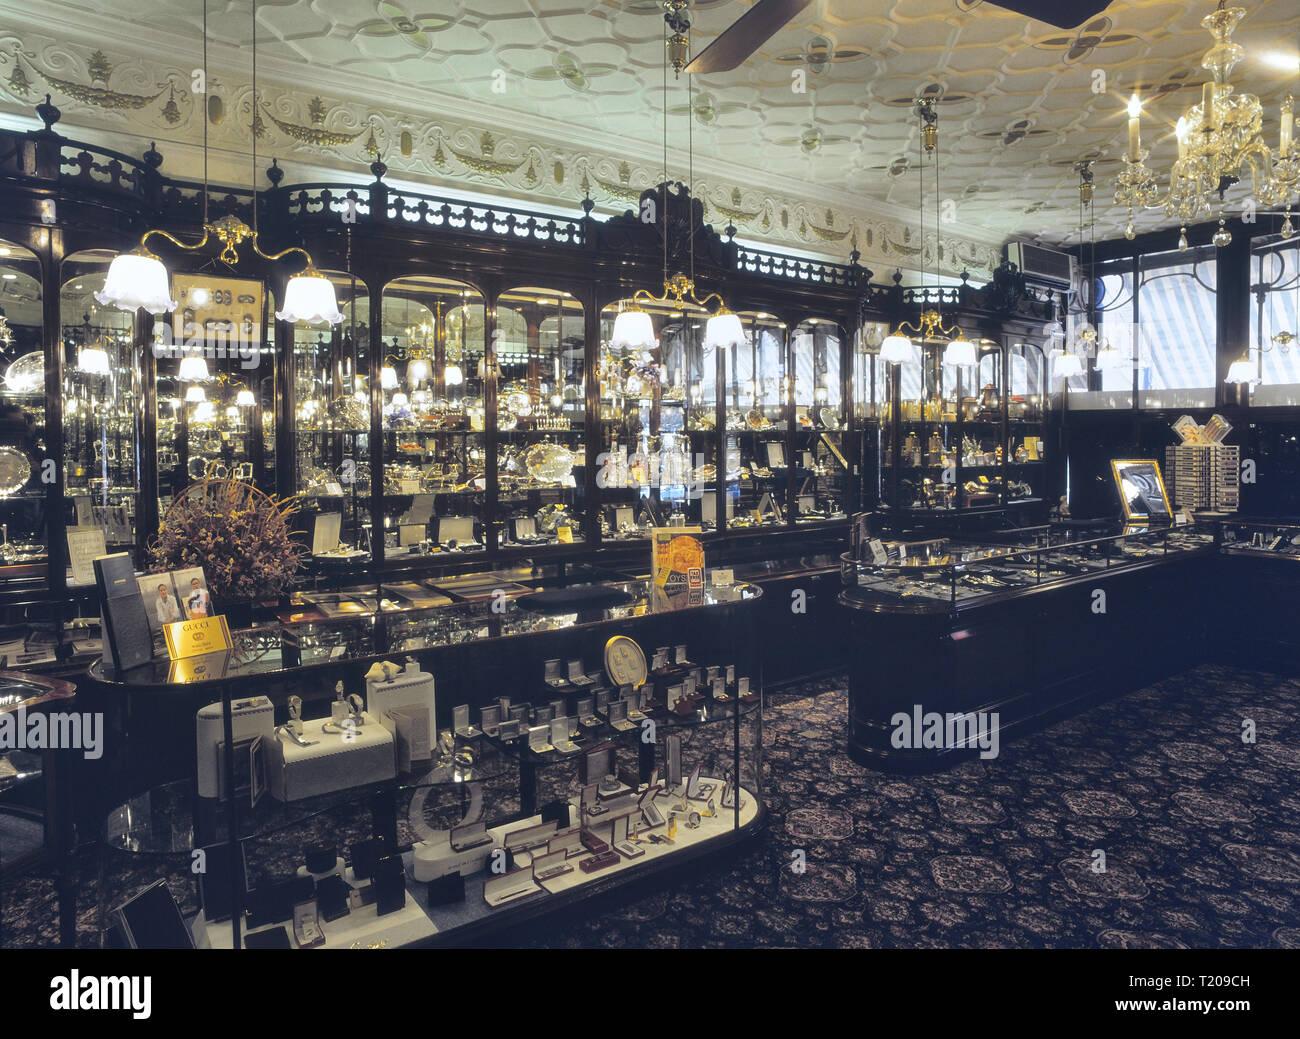 Shop interior of Payne & Son Ltd Jewellers & Silversmiths. Tunbridge Wells, Kent, England, UK Stock Photo